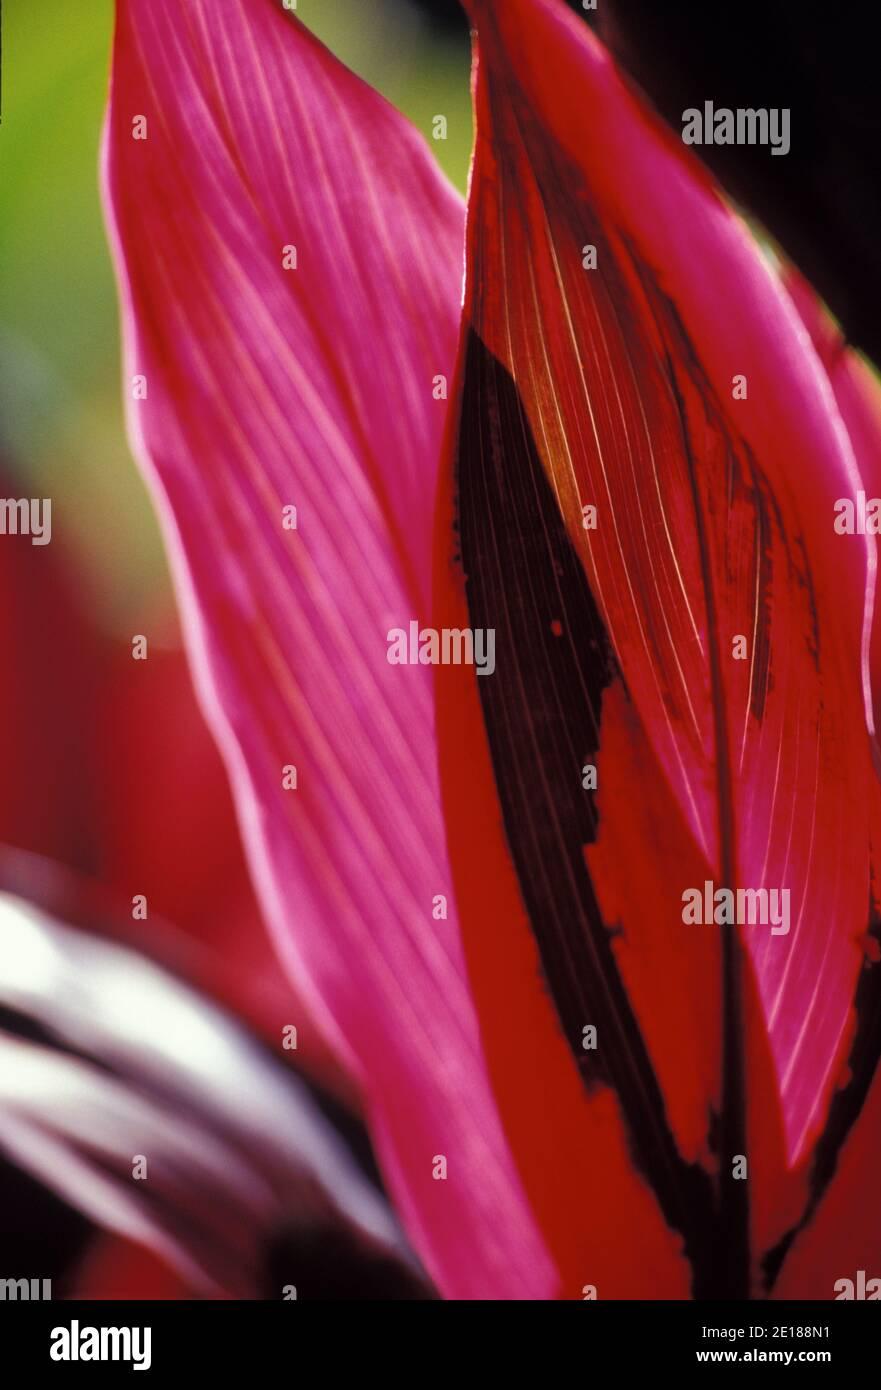 Roten Ti Blatt Closeup, Hintergrundbeleuchtung von Sonne Stockfoto